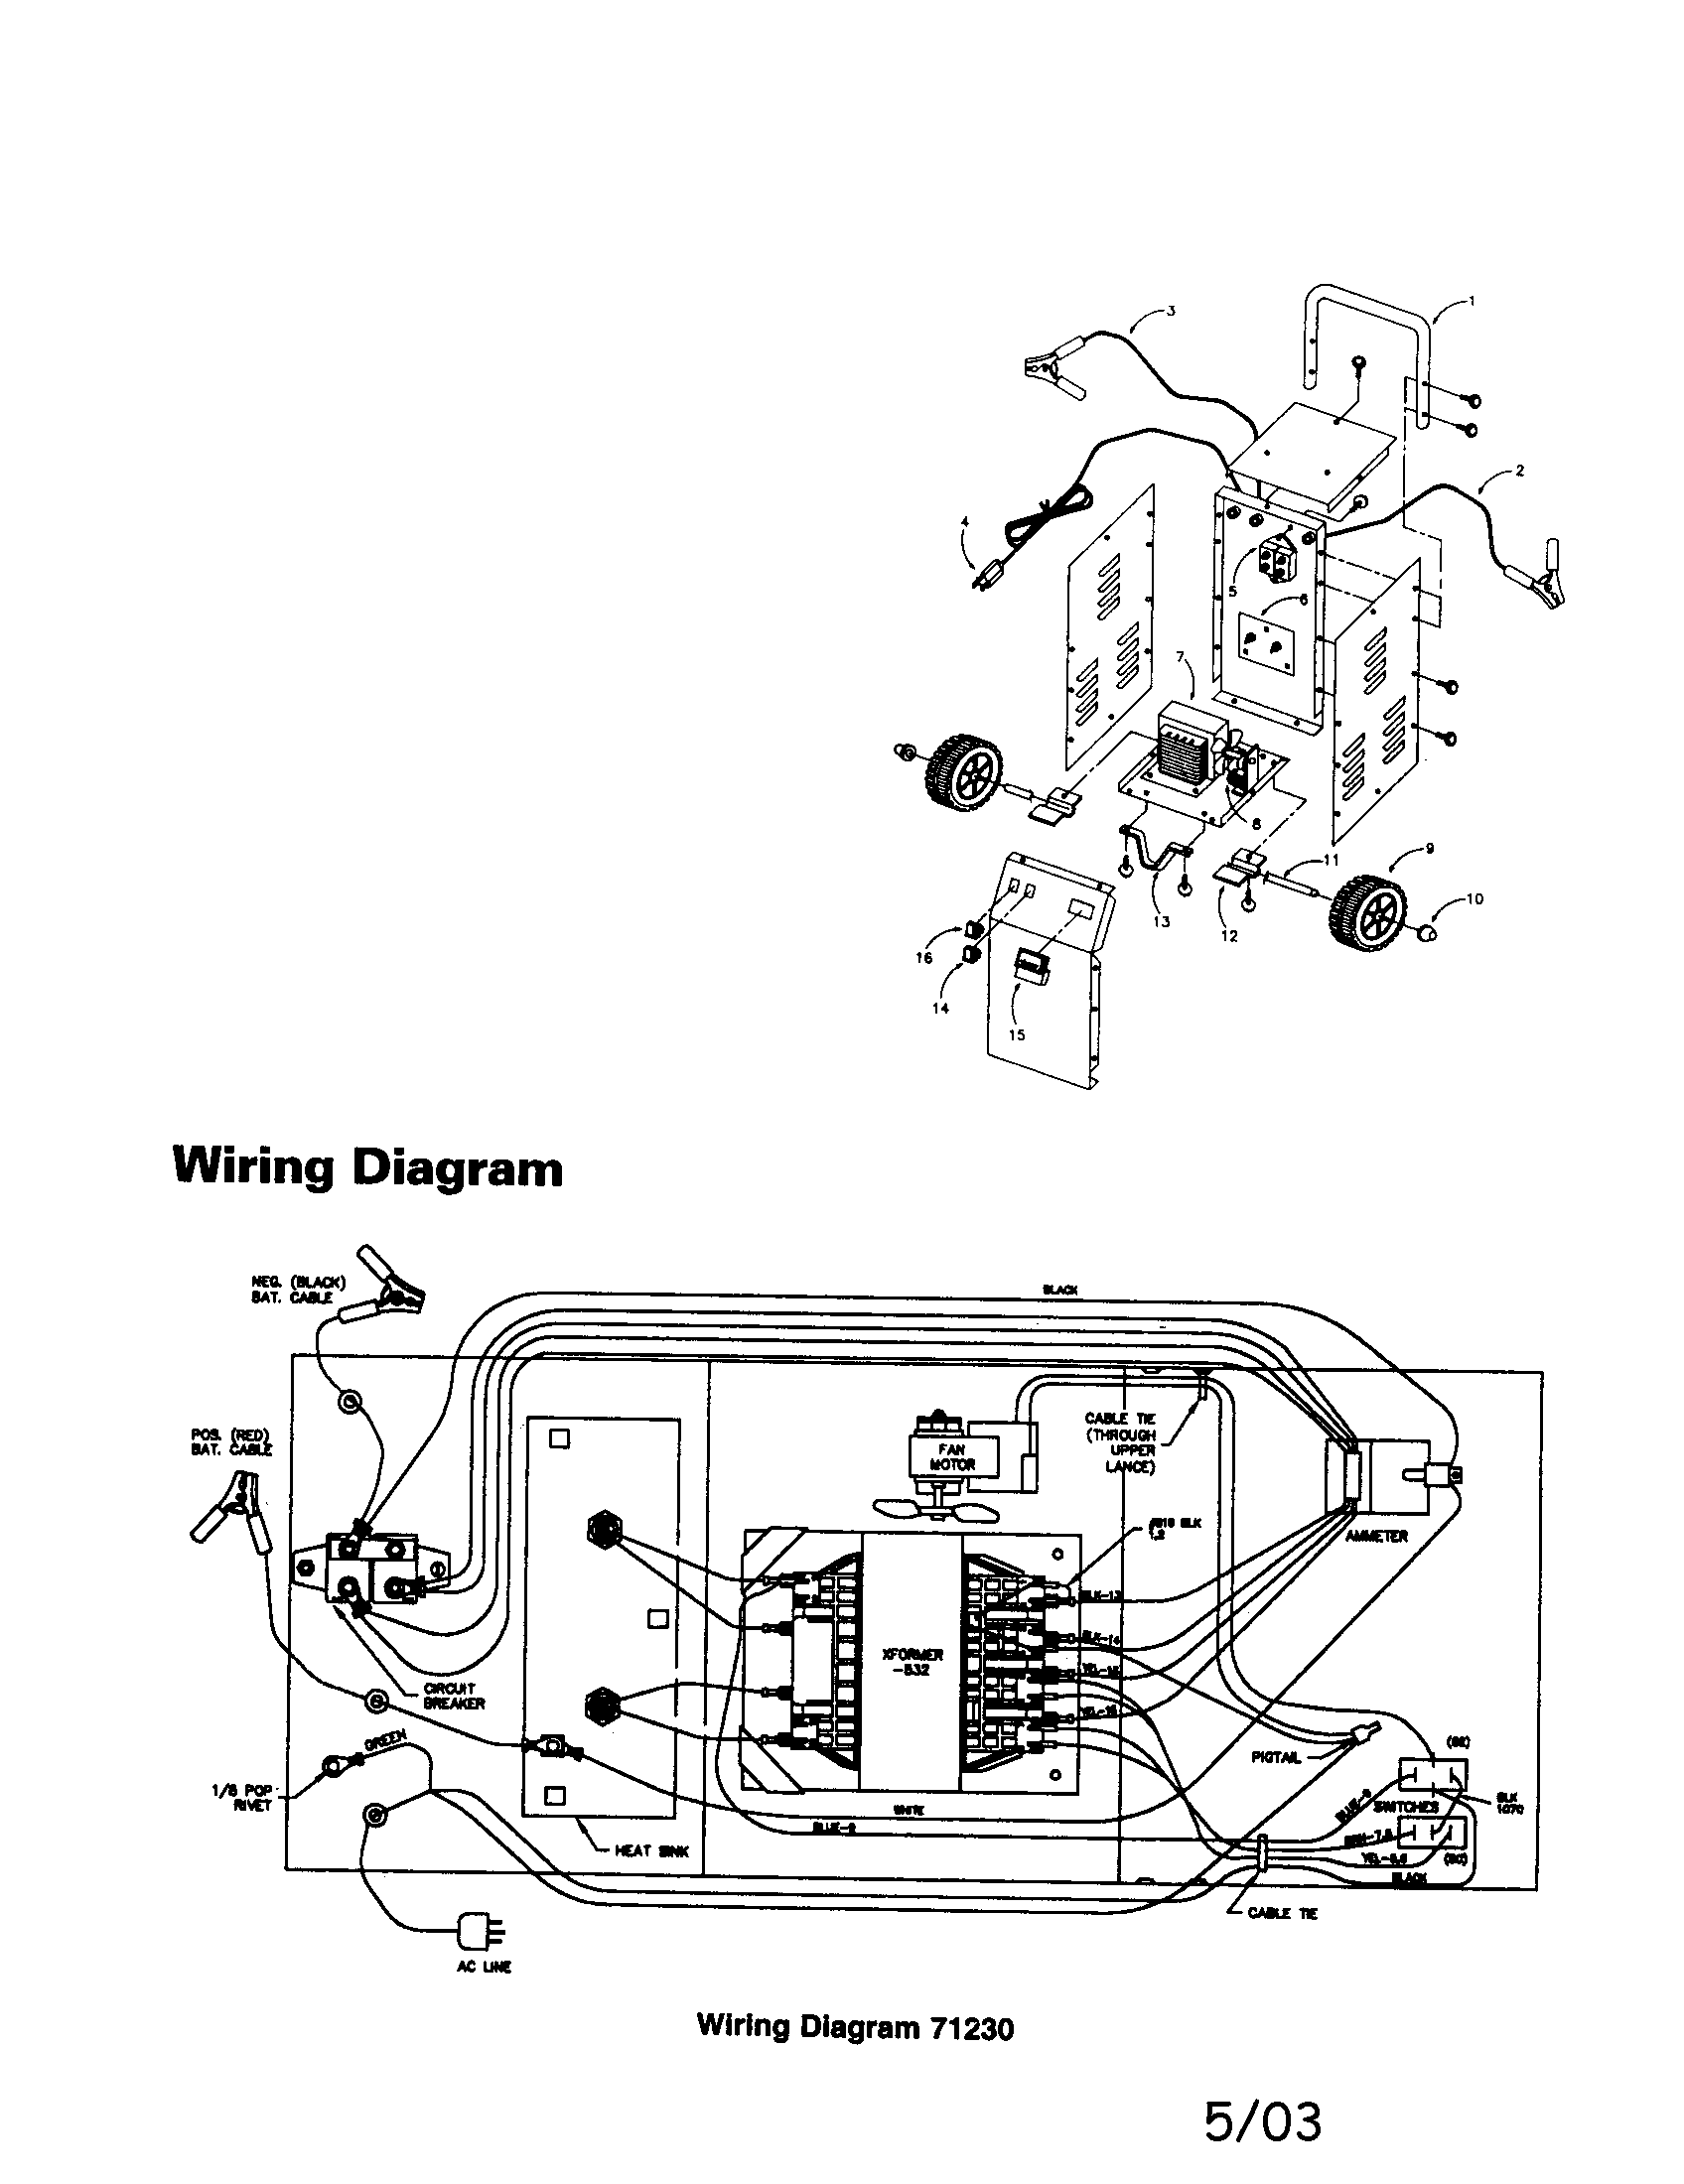 Activebandpassfilter Basiccircuit Circuit Diagram Seekiccom